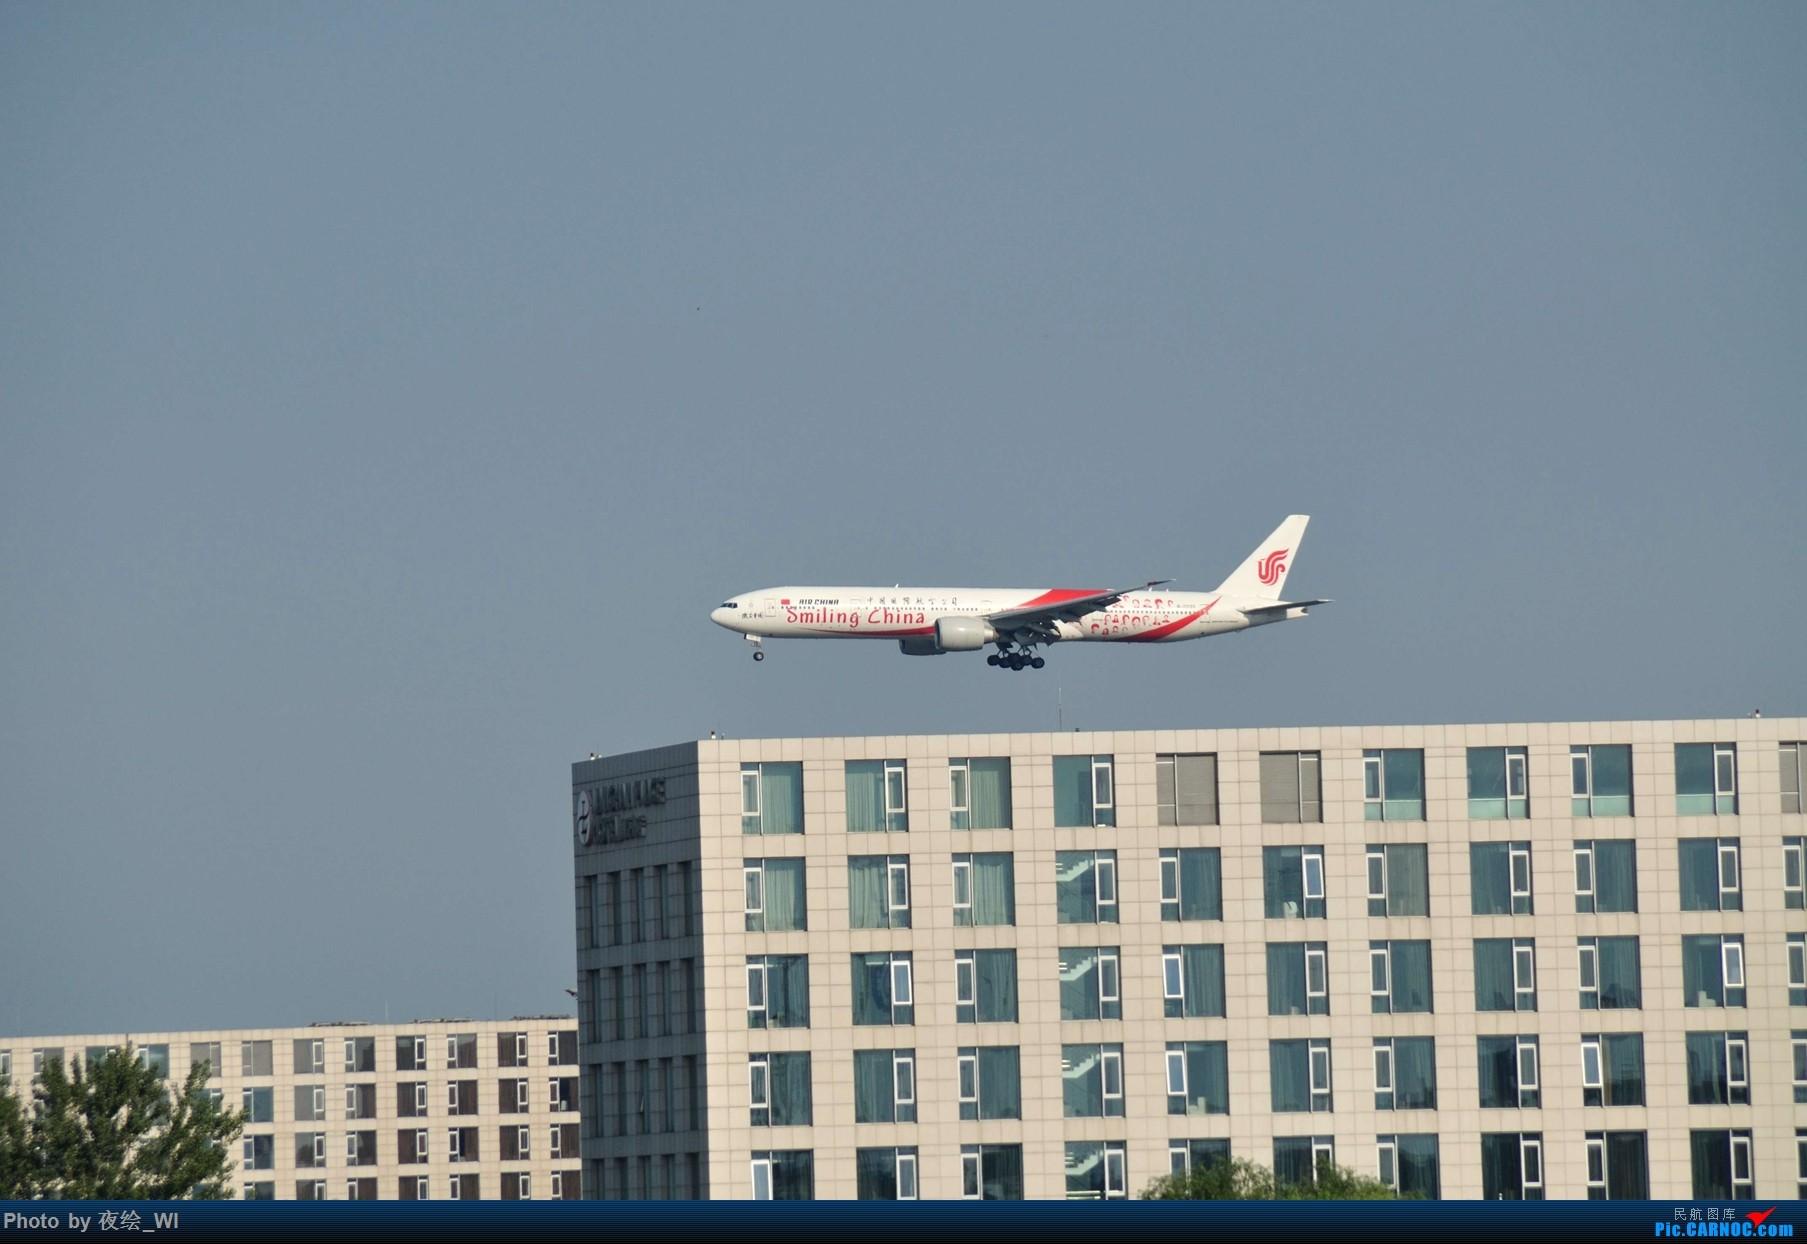 Re:[原创]【PEK】初刷八卦台,拍得飞起! BOEING 777-300ER B-2035 中国北京首都国际机场